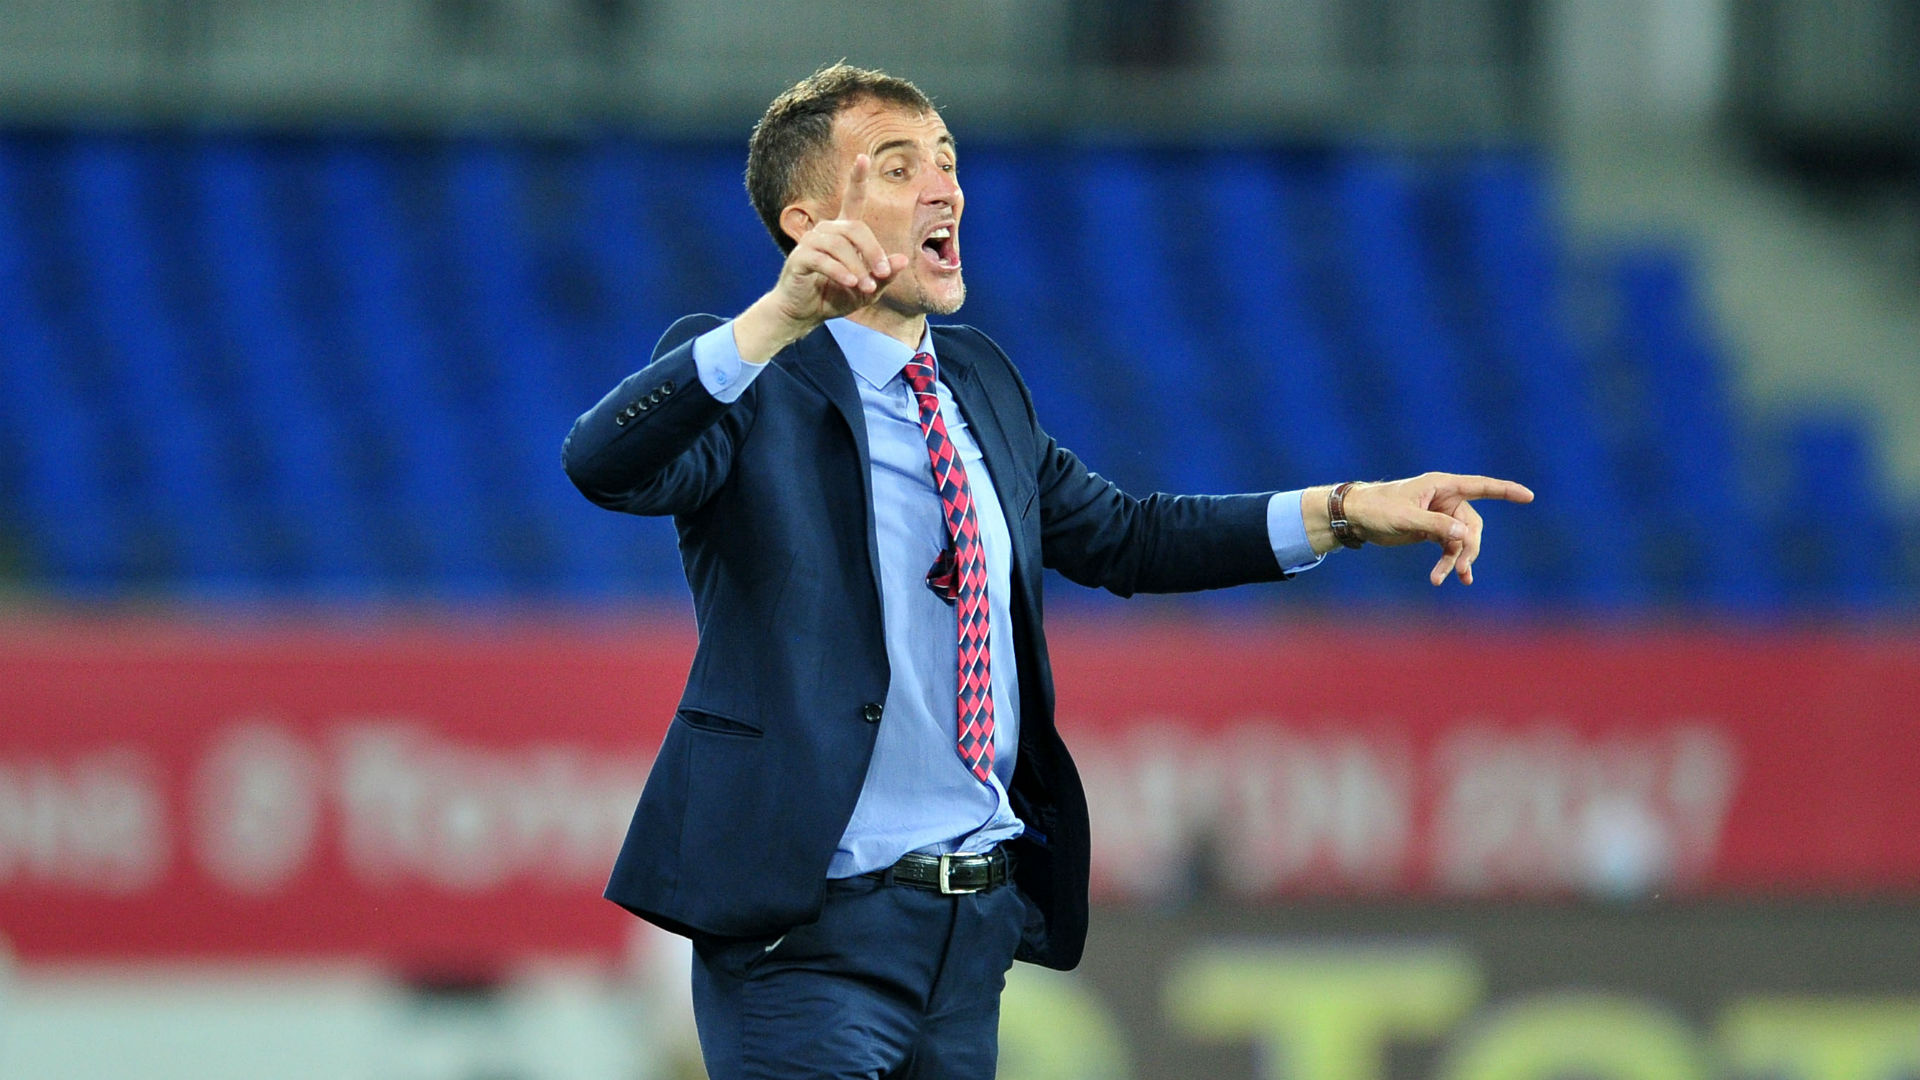 Orlando Pirates coach, Milutin Micho Sredojevic